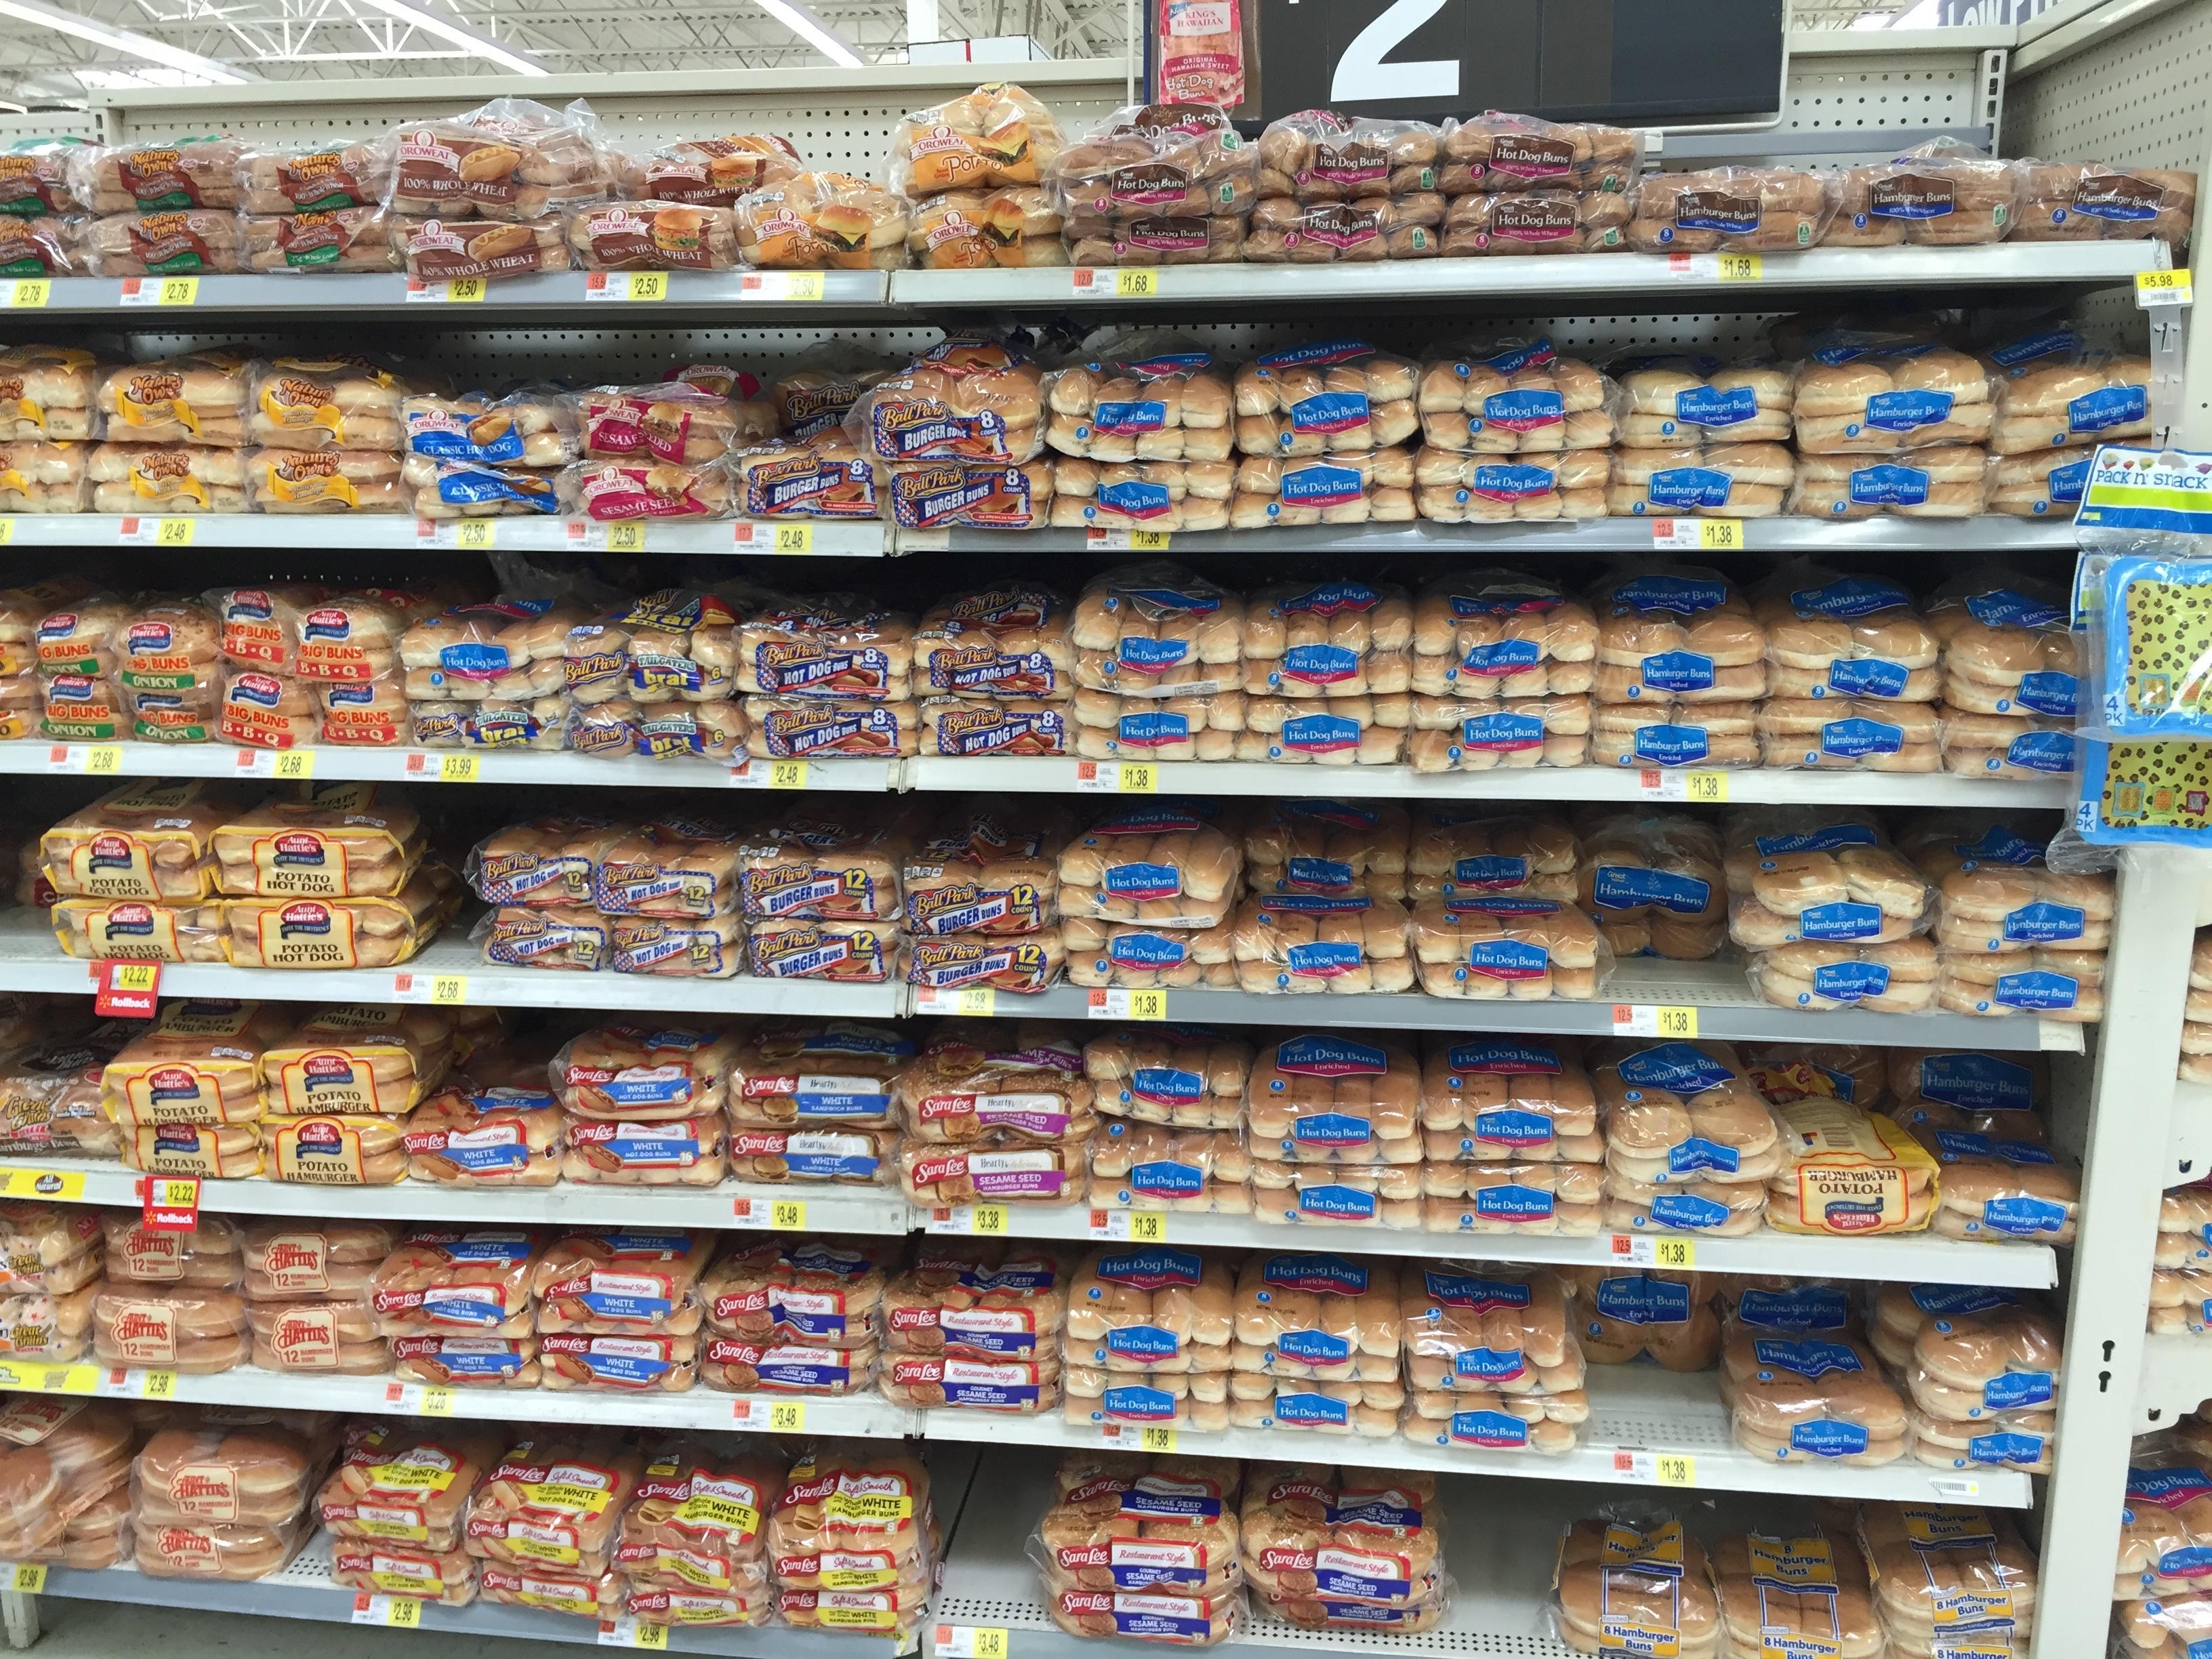 Amerikaanse winkelketens